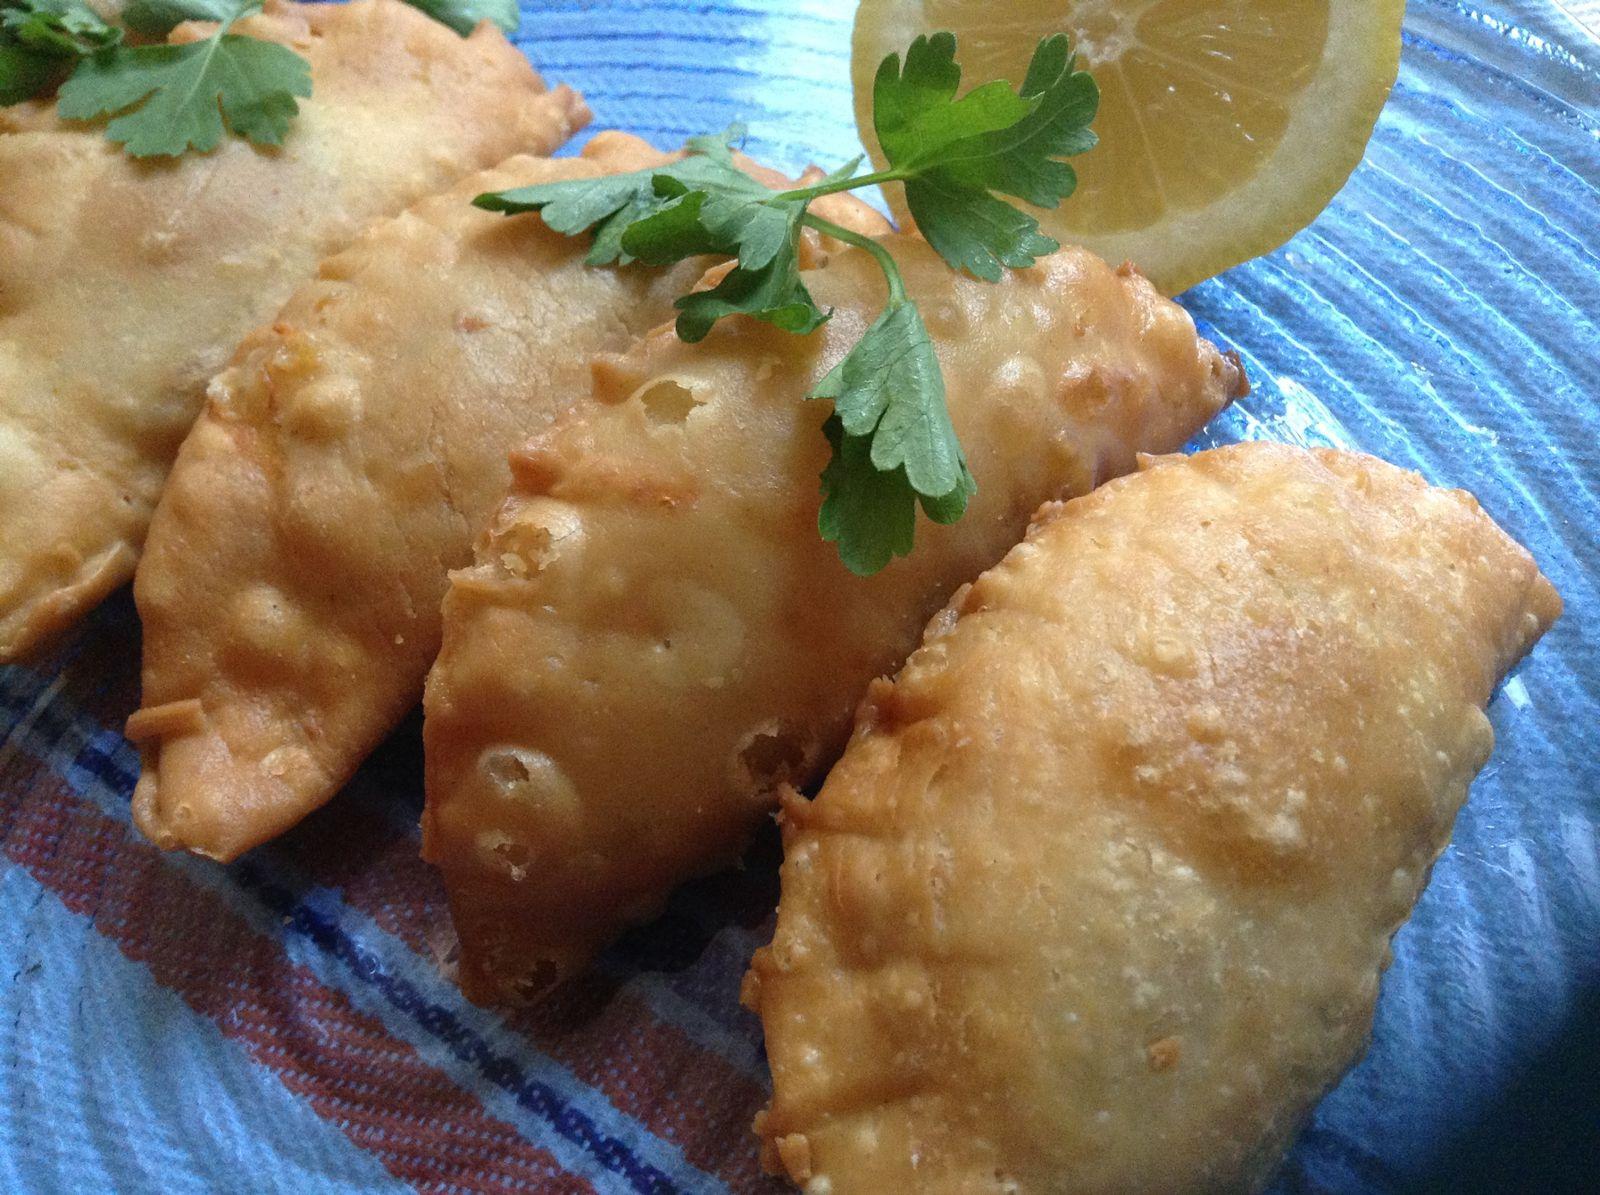 Bourek laadjine à la viande hachée pour Ramadan